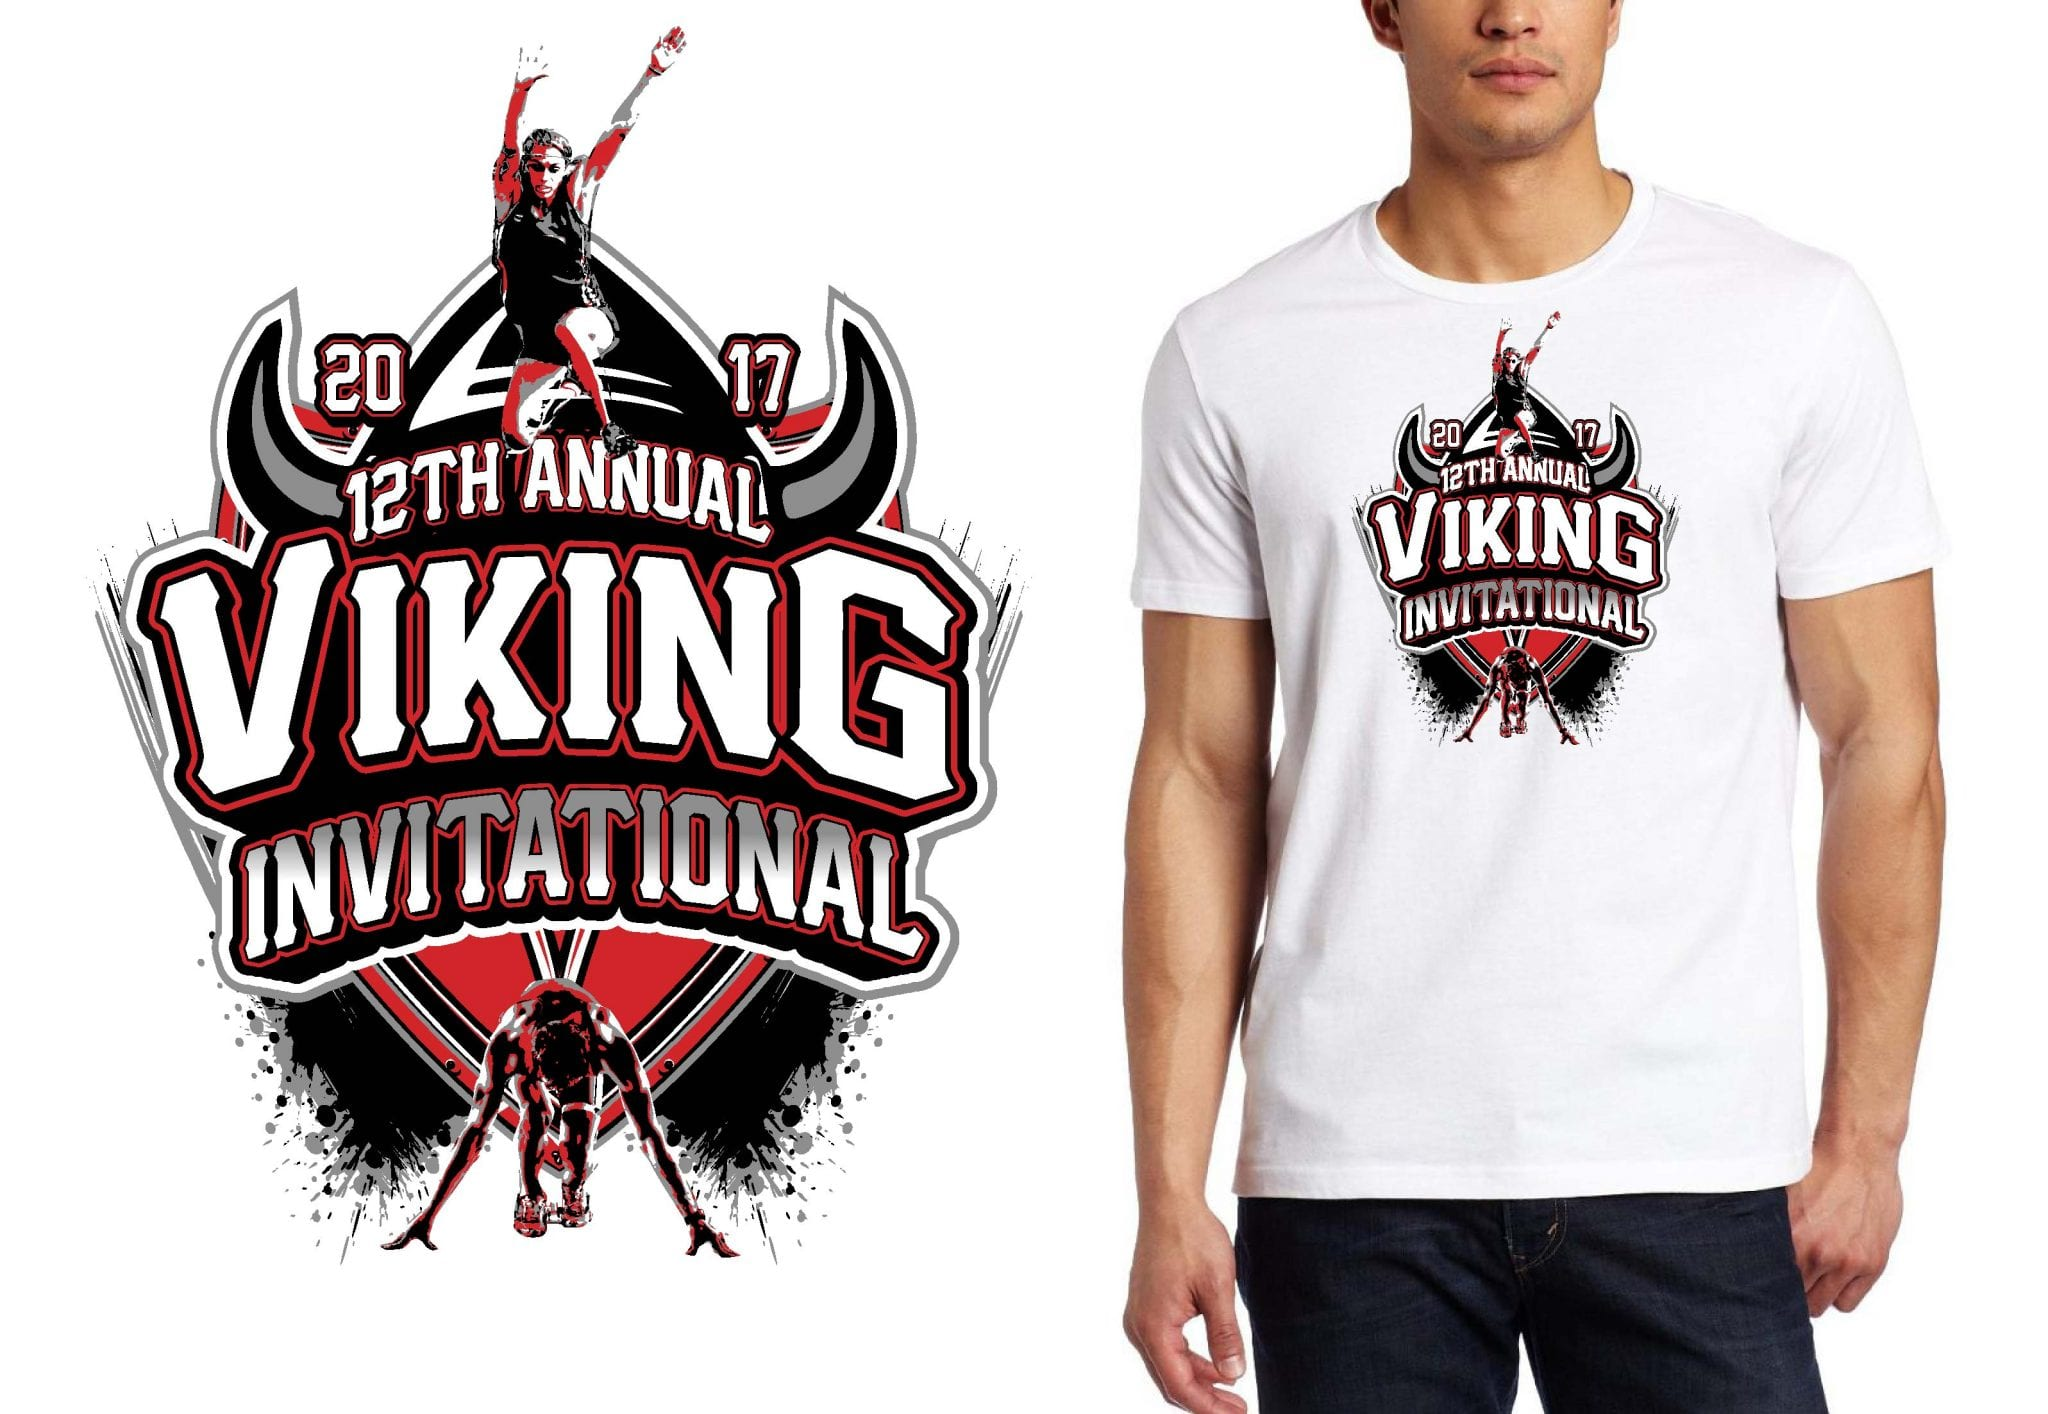 TRACK LOGO for Viking-Invitational T-SHIRT UrArtStudio